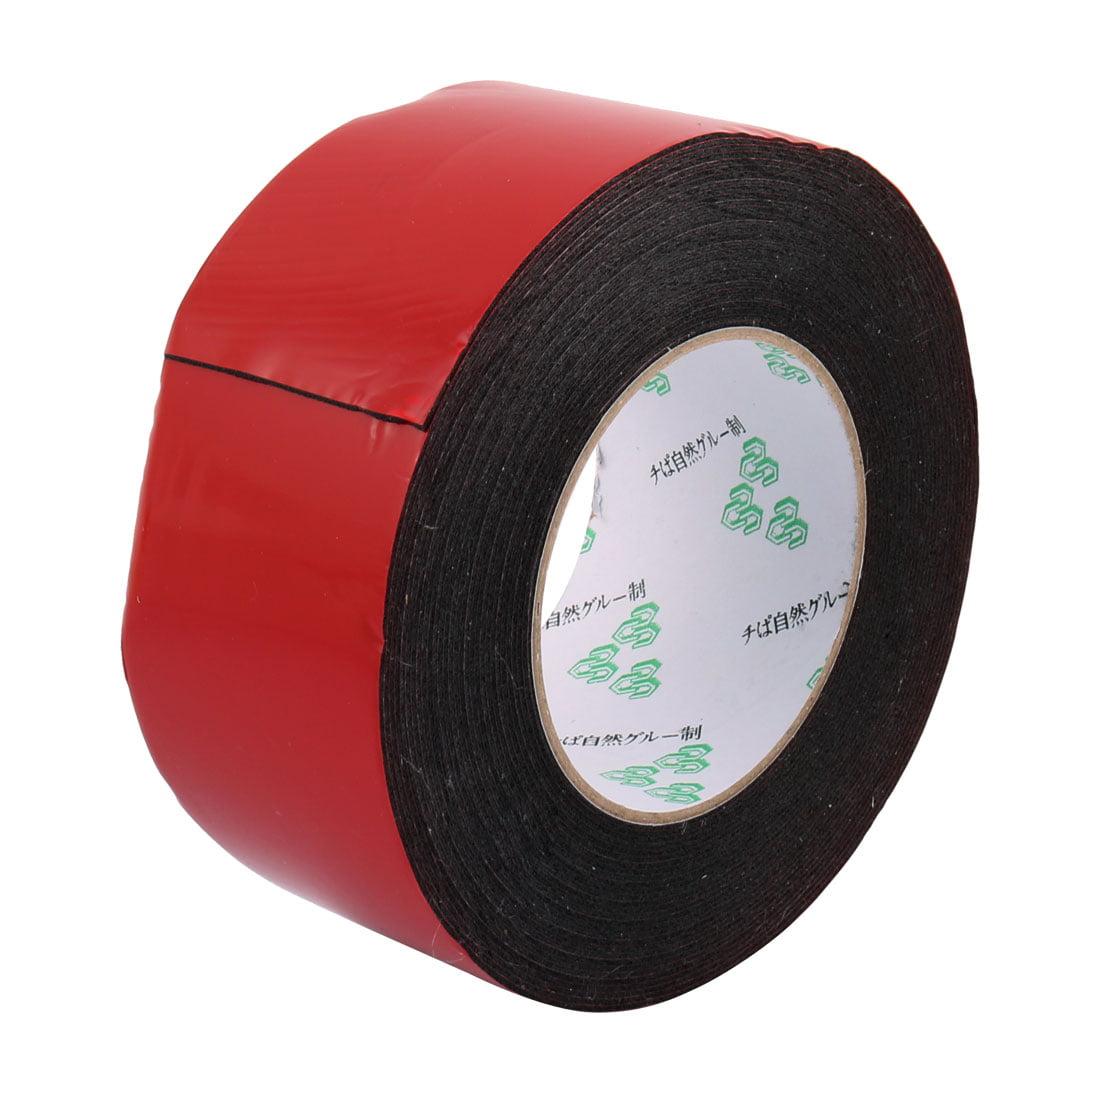 Unique Bargains 60mm x 1mm Double Sided Sponge Tape Adhesive Sticker Shockproof SpongeTape 10M